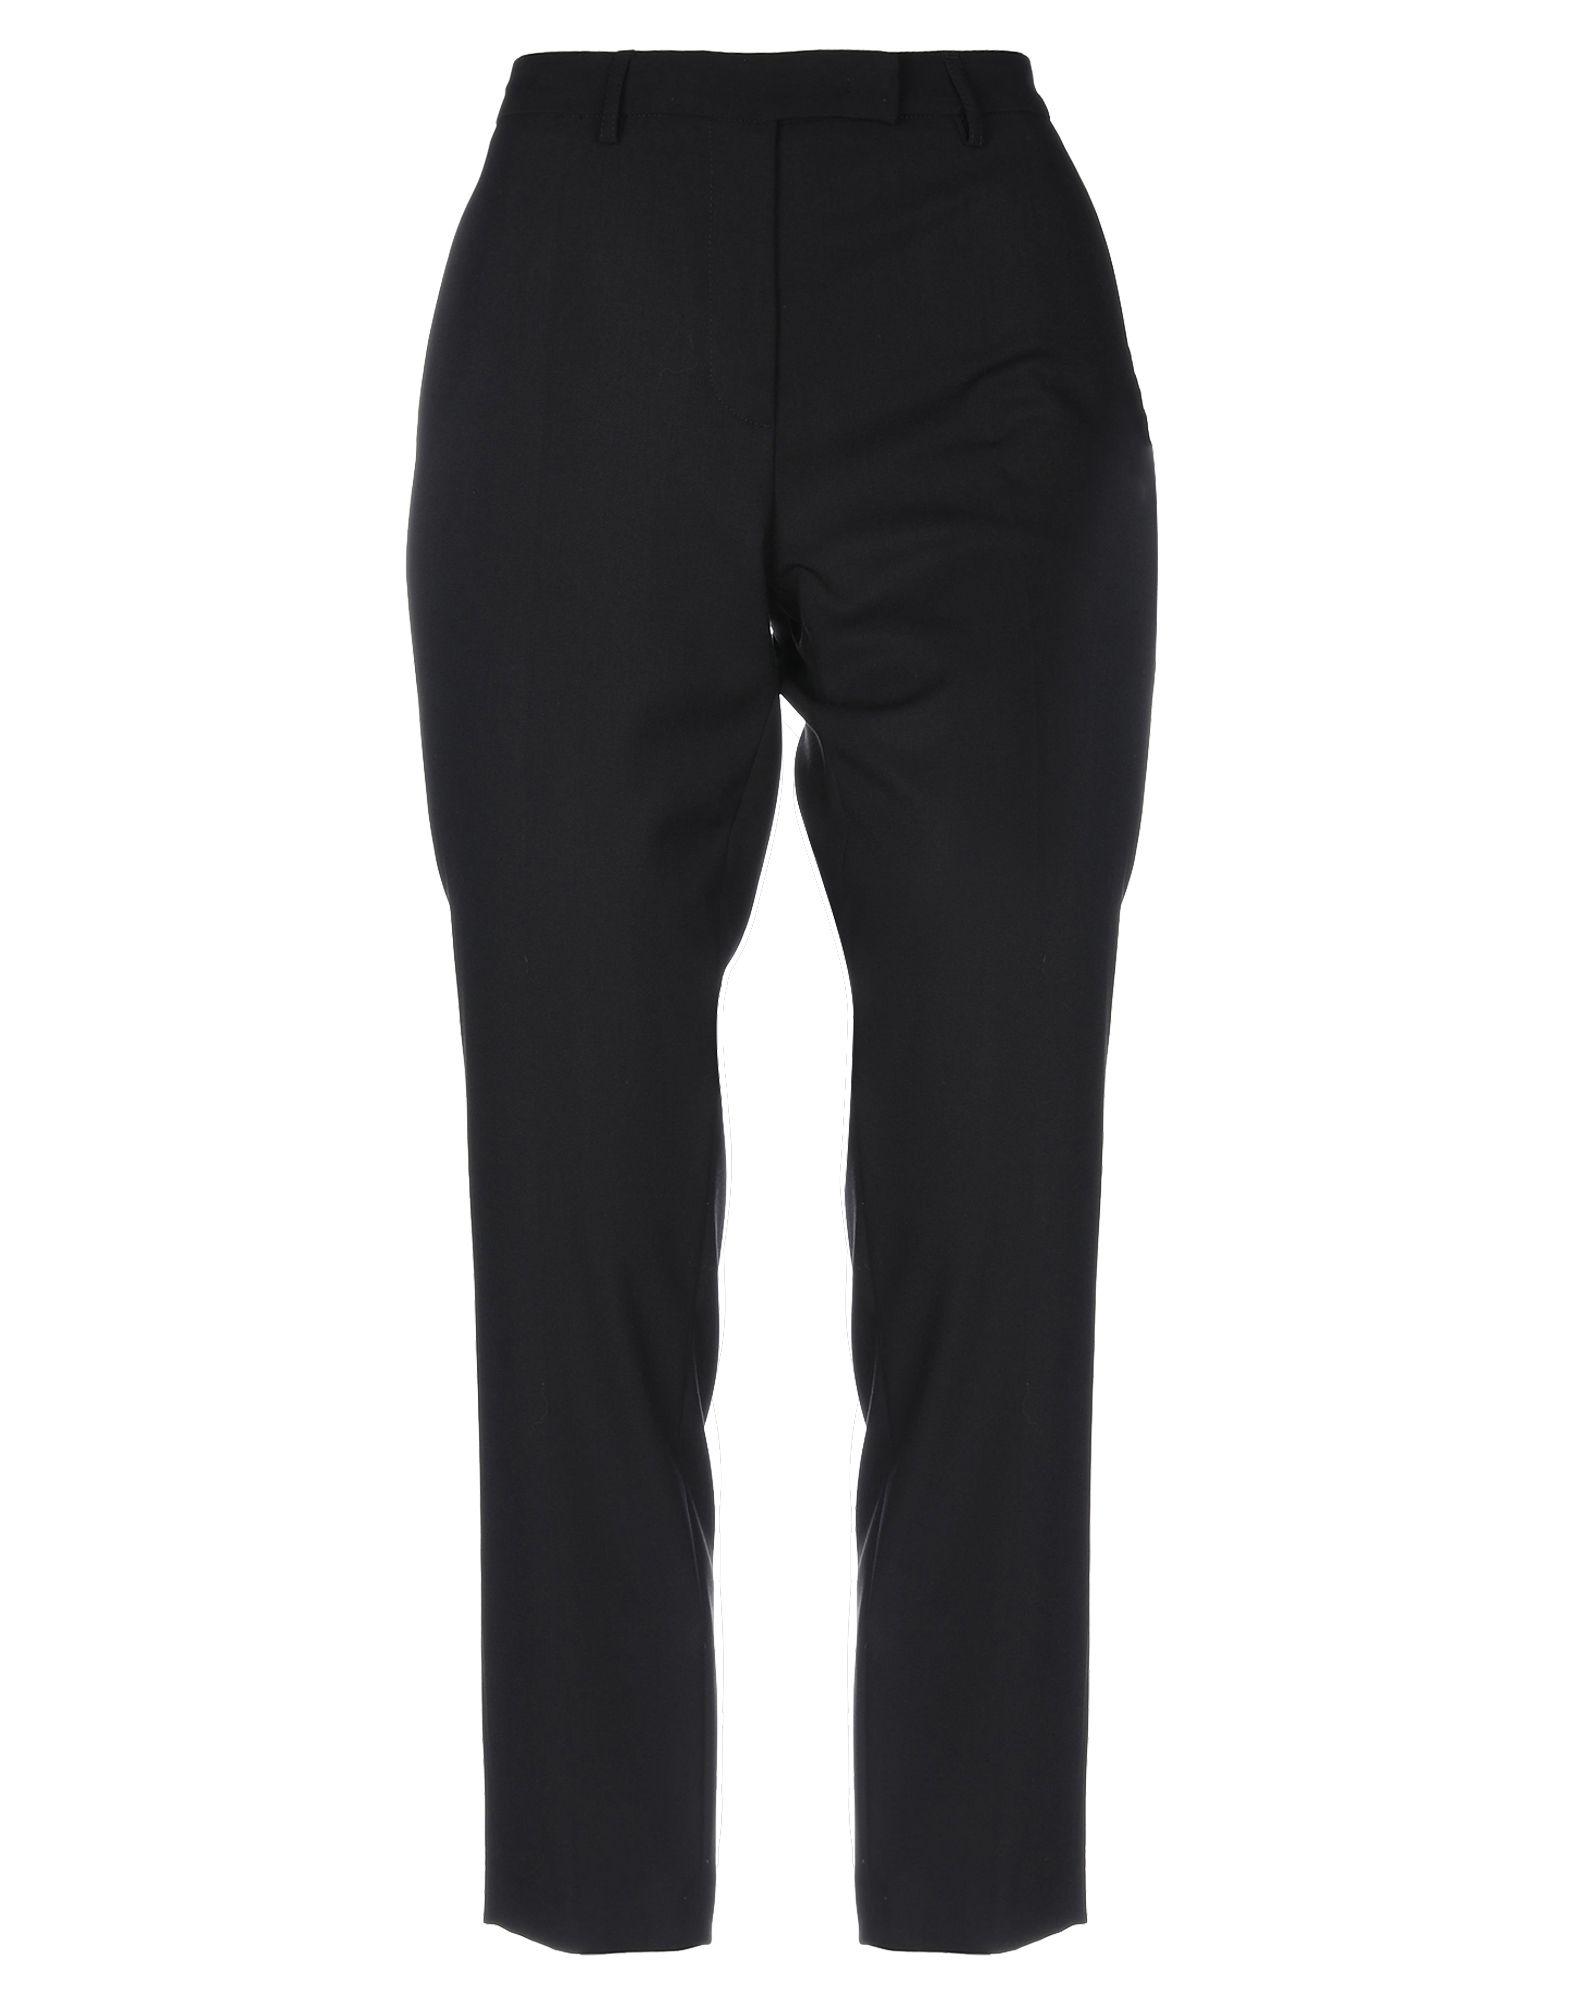 Pantalone Diane Krüger donna donna donna - 13351807AS c56